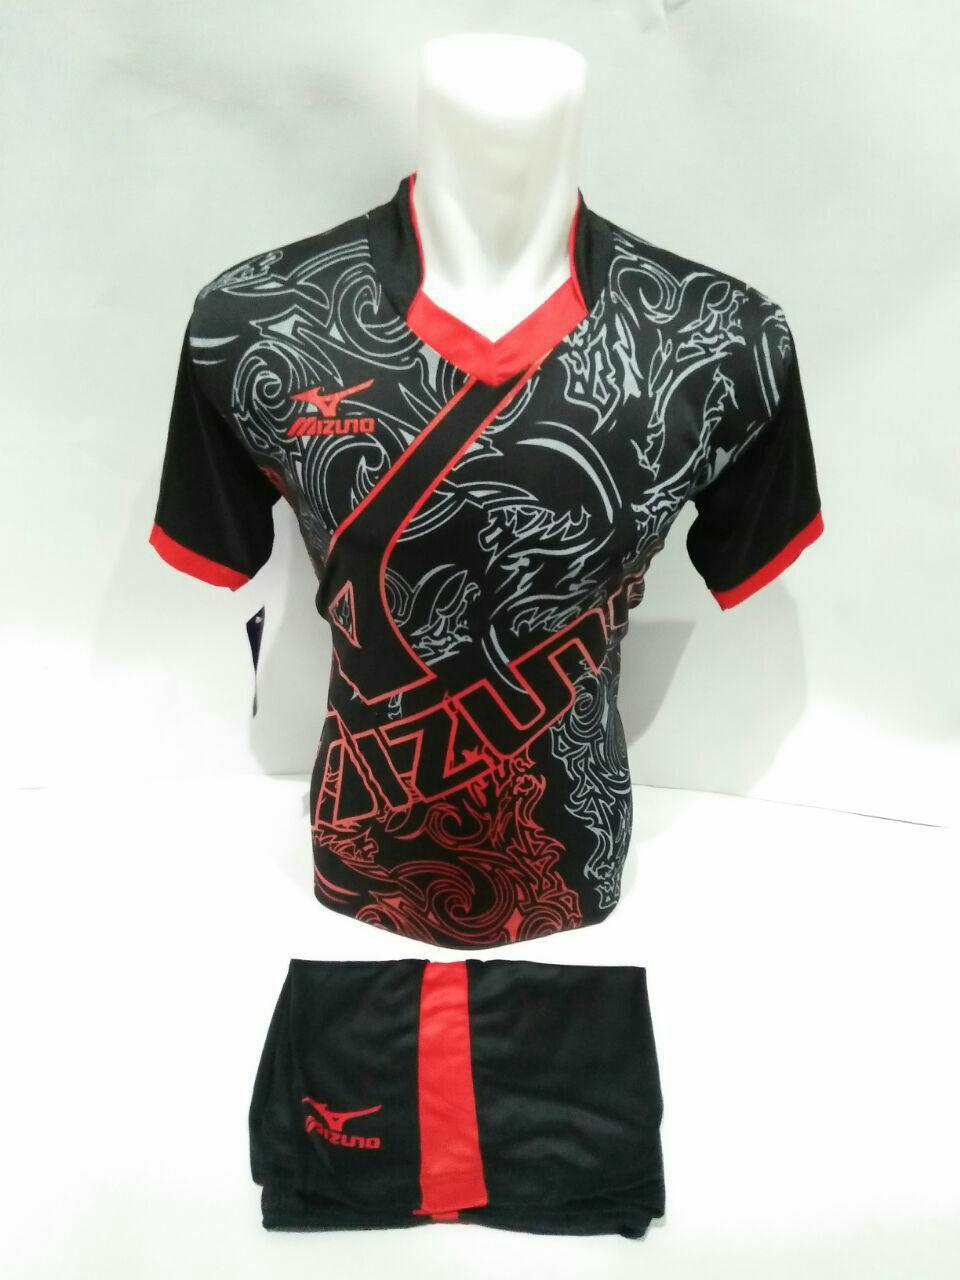 Baju Kaos Jersey Olahraga Setelan Bola Futsal Volly Mz 16 Hitam Merah